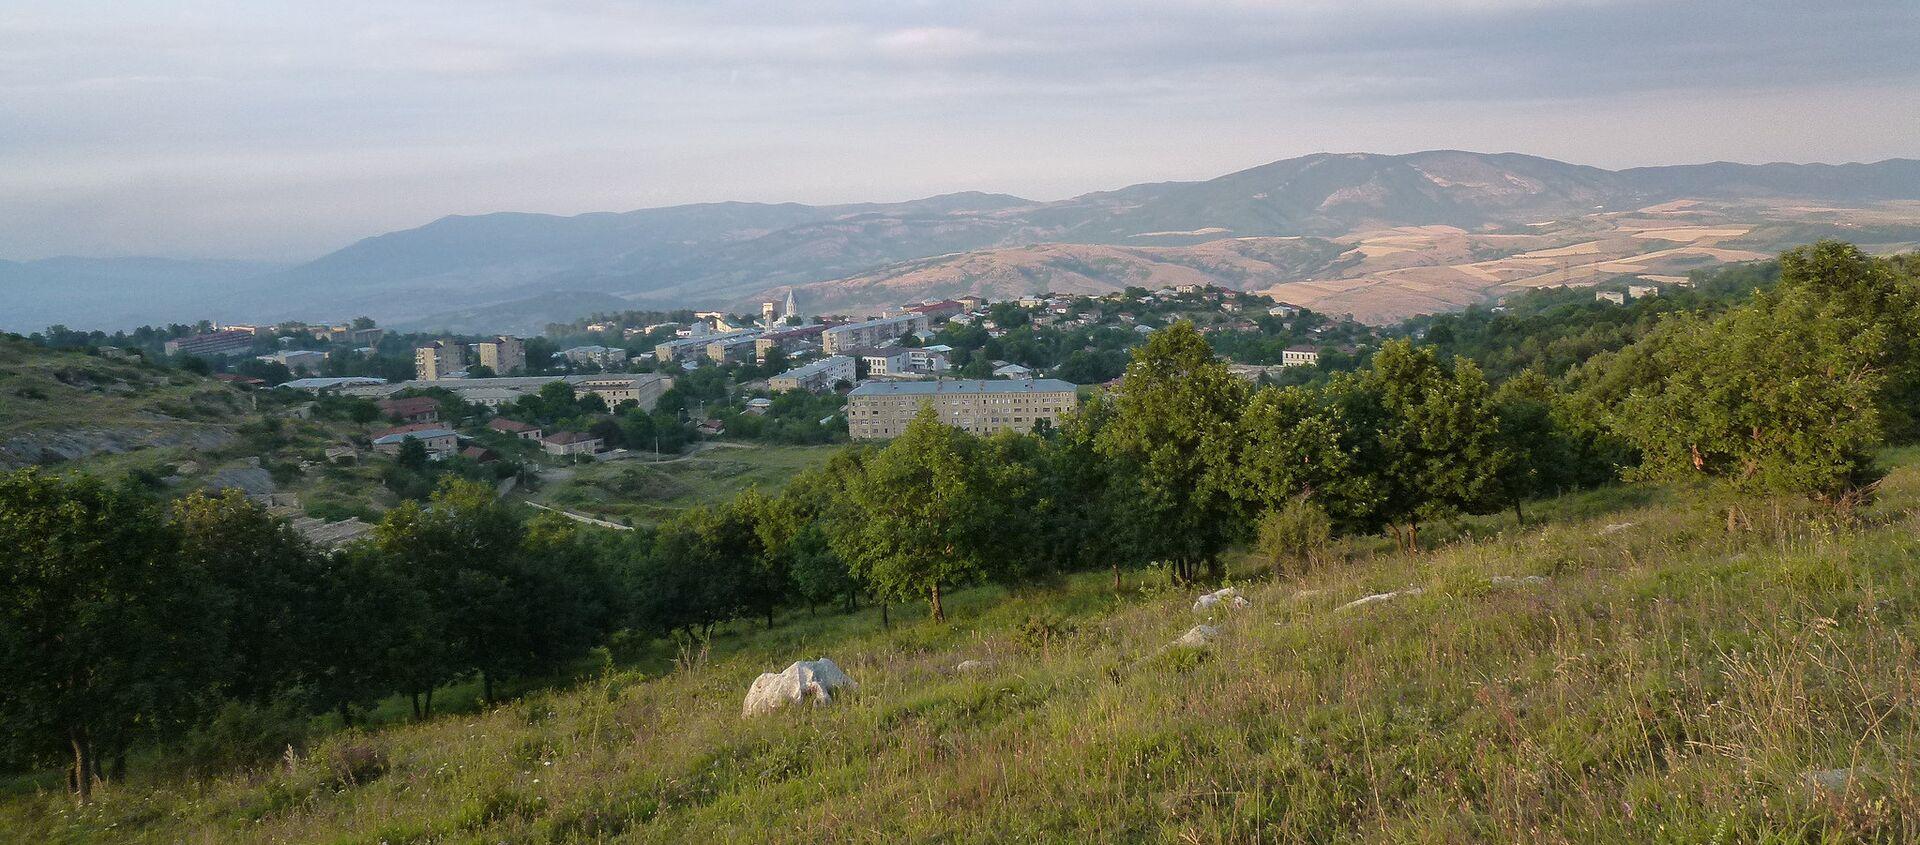 Город Шуша - Sputnik Азербайджан, 1920, 09.03.2021